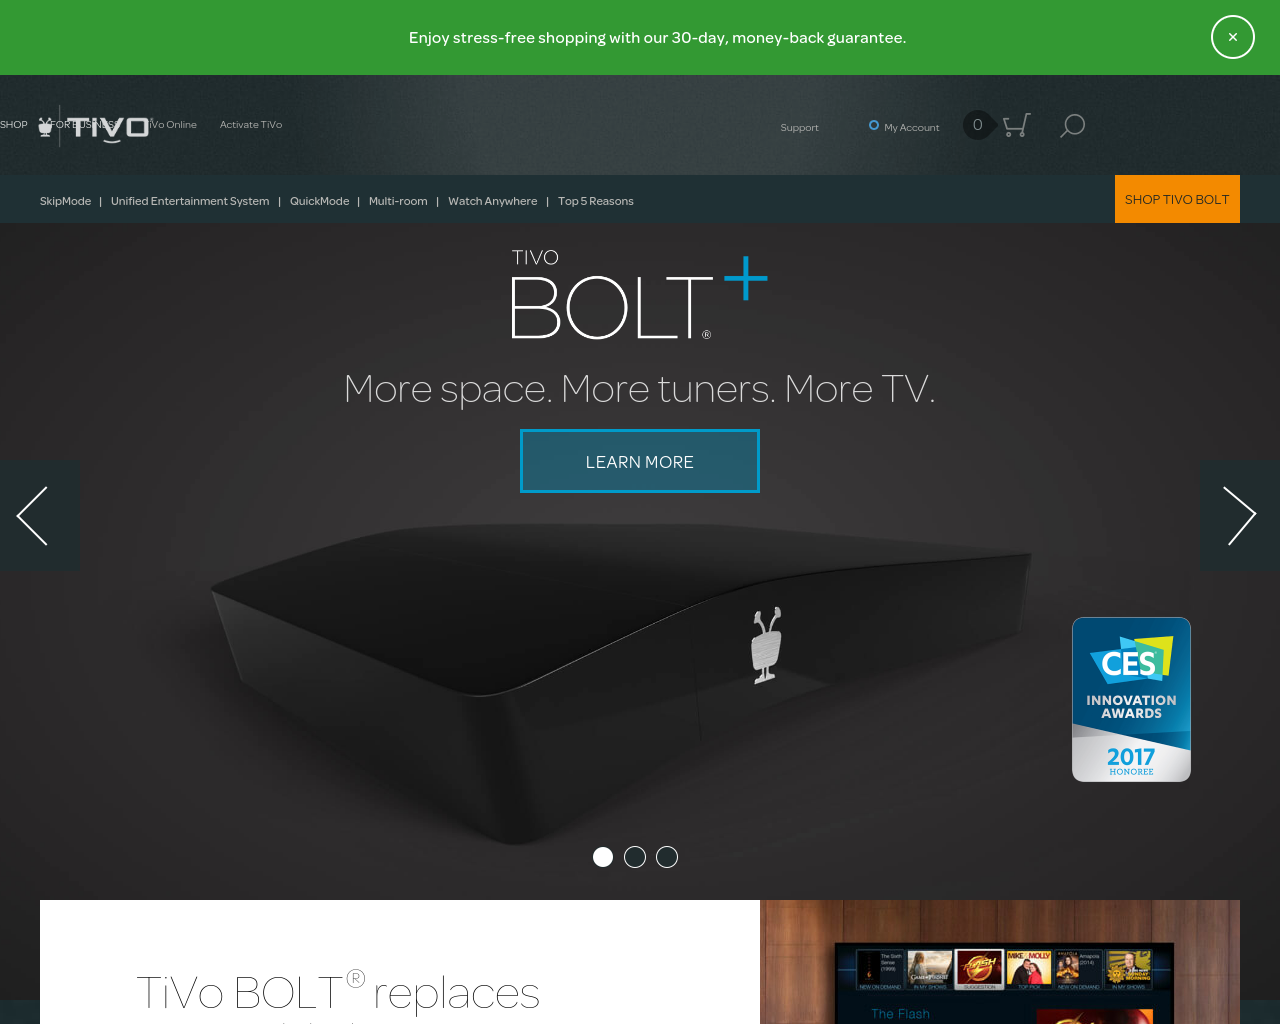 Tivo-Advertising-Reviews-Pricing